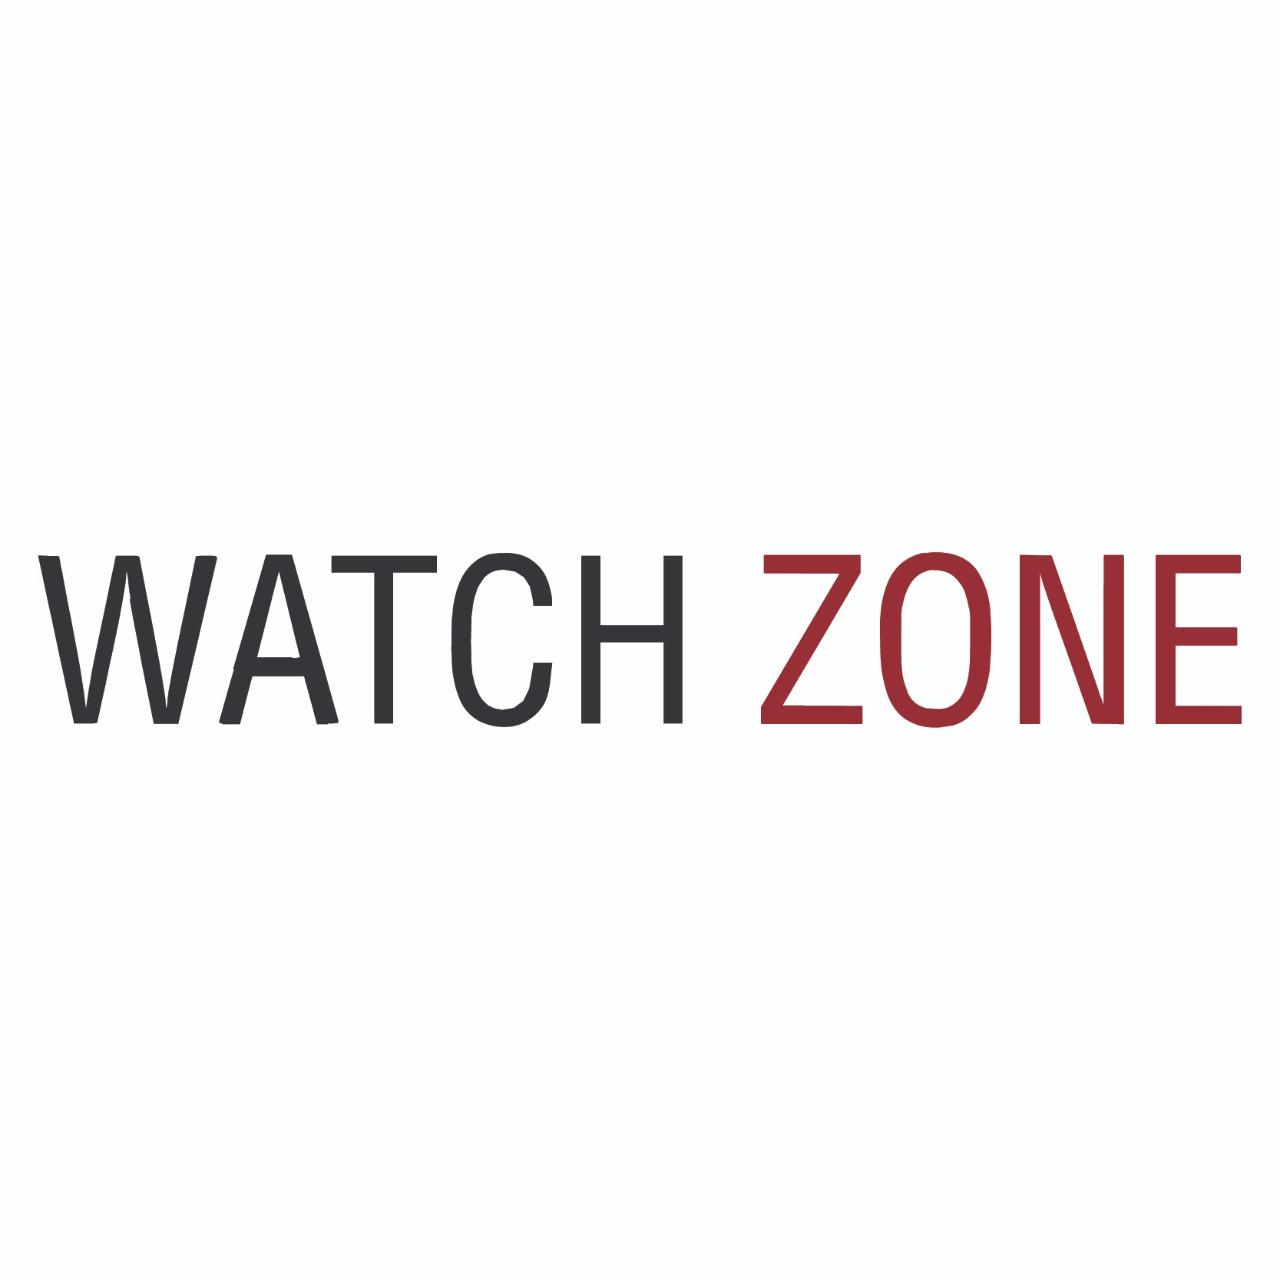 WATCH ZONE